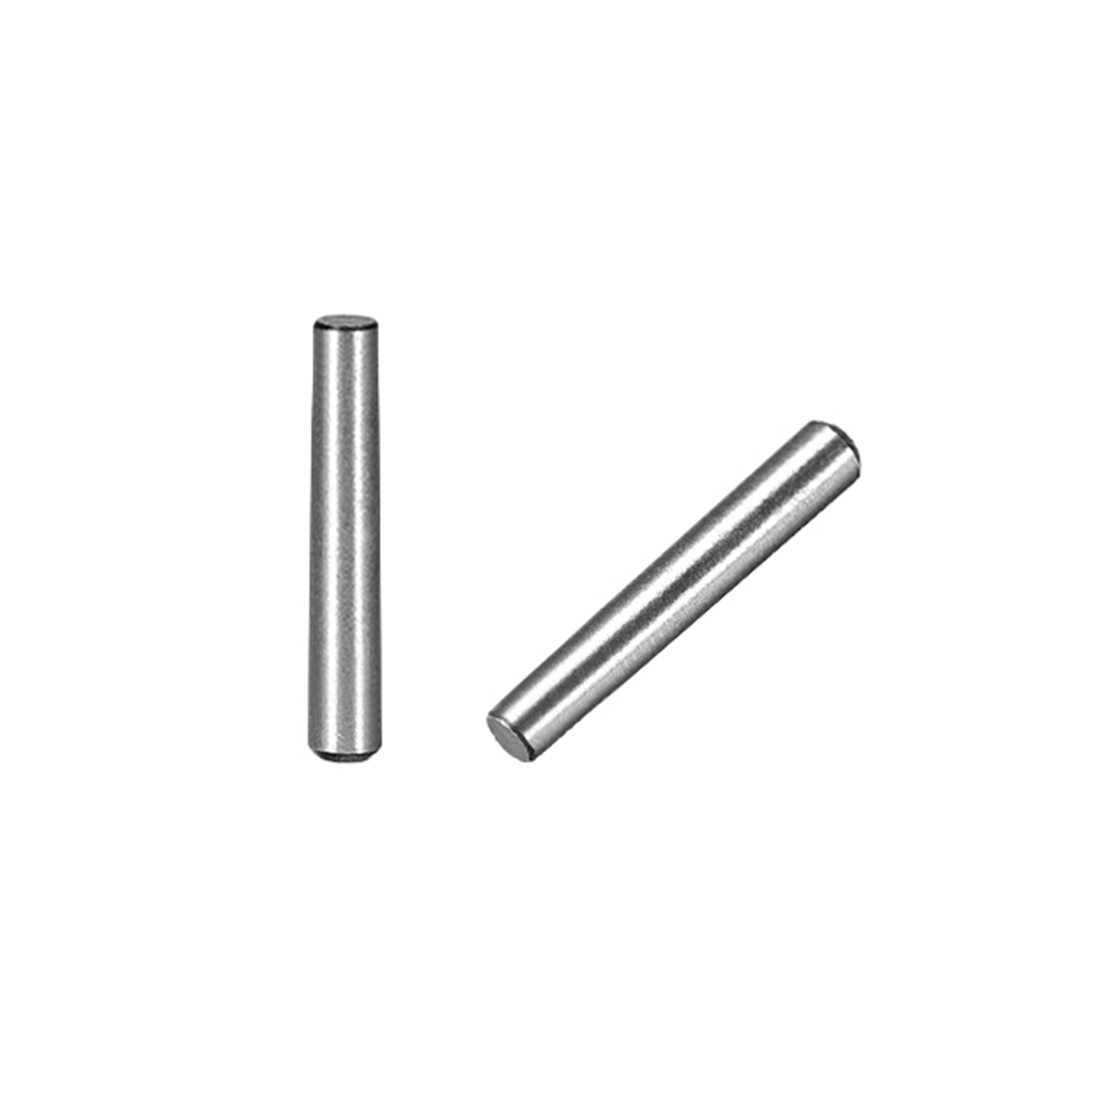 45# Carbon Steel GB117 12mm Length 3mm Small End Diameter 1:50 Taper Pin 50Pcs